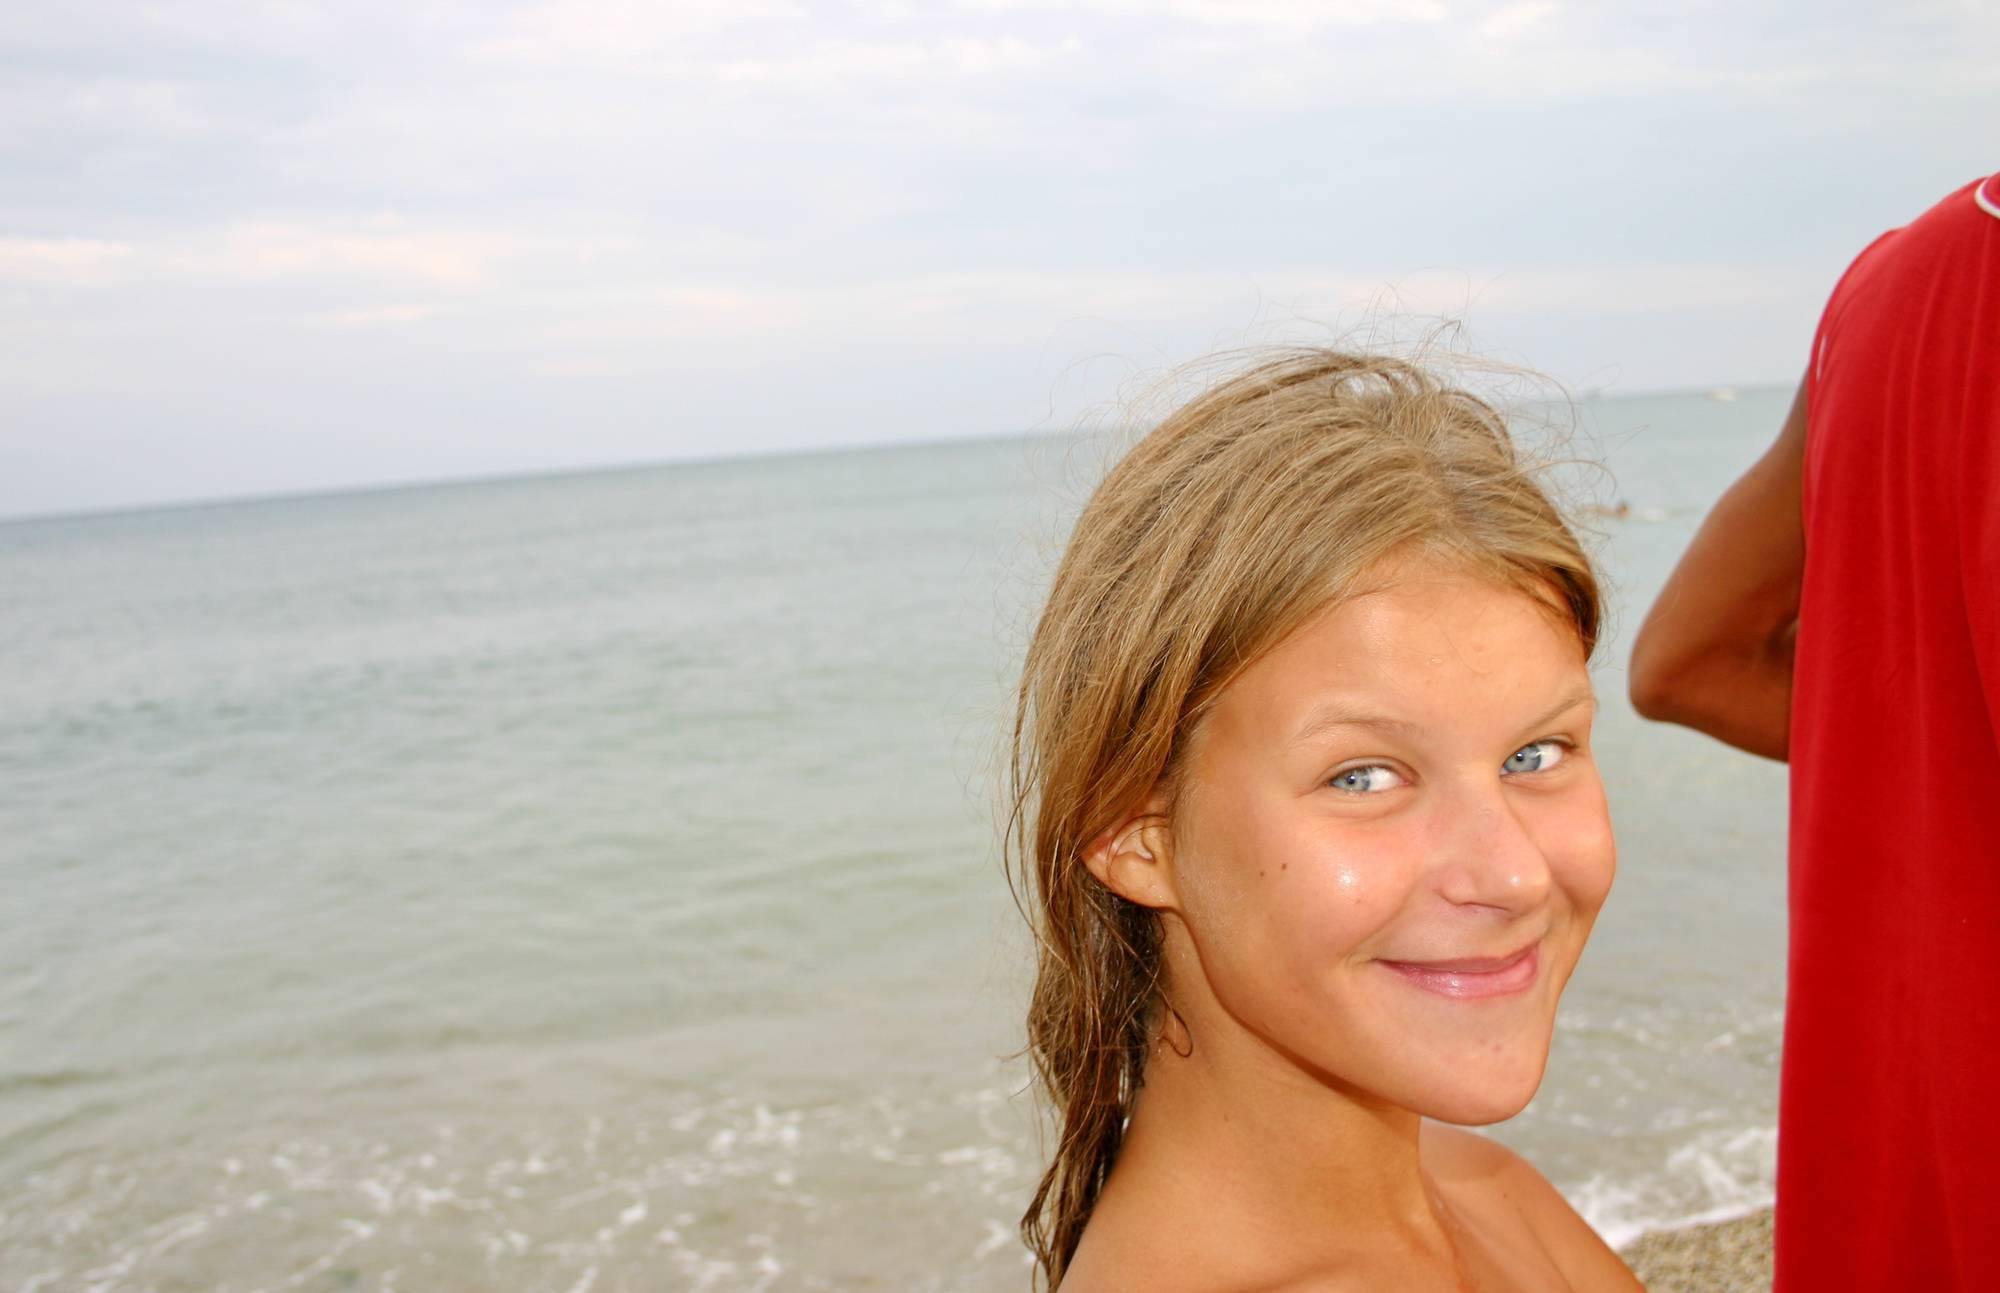 Purenudism Photos-End of Day Beach Profiles - 1